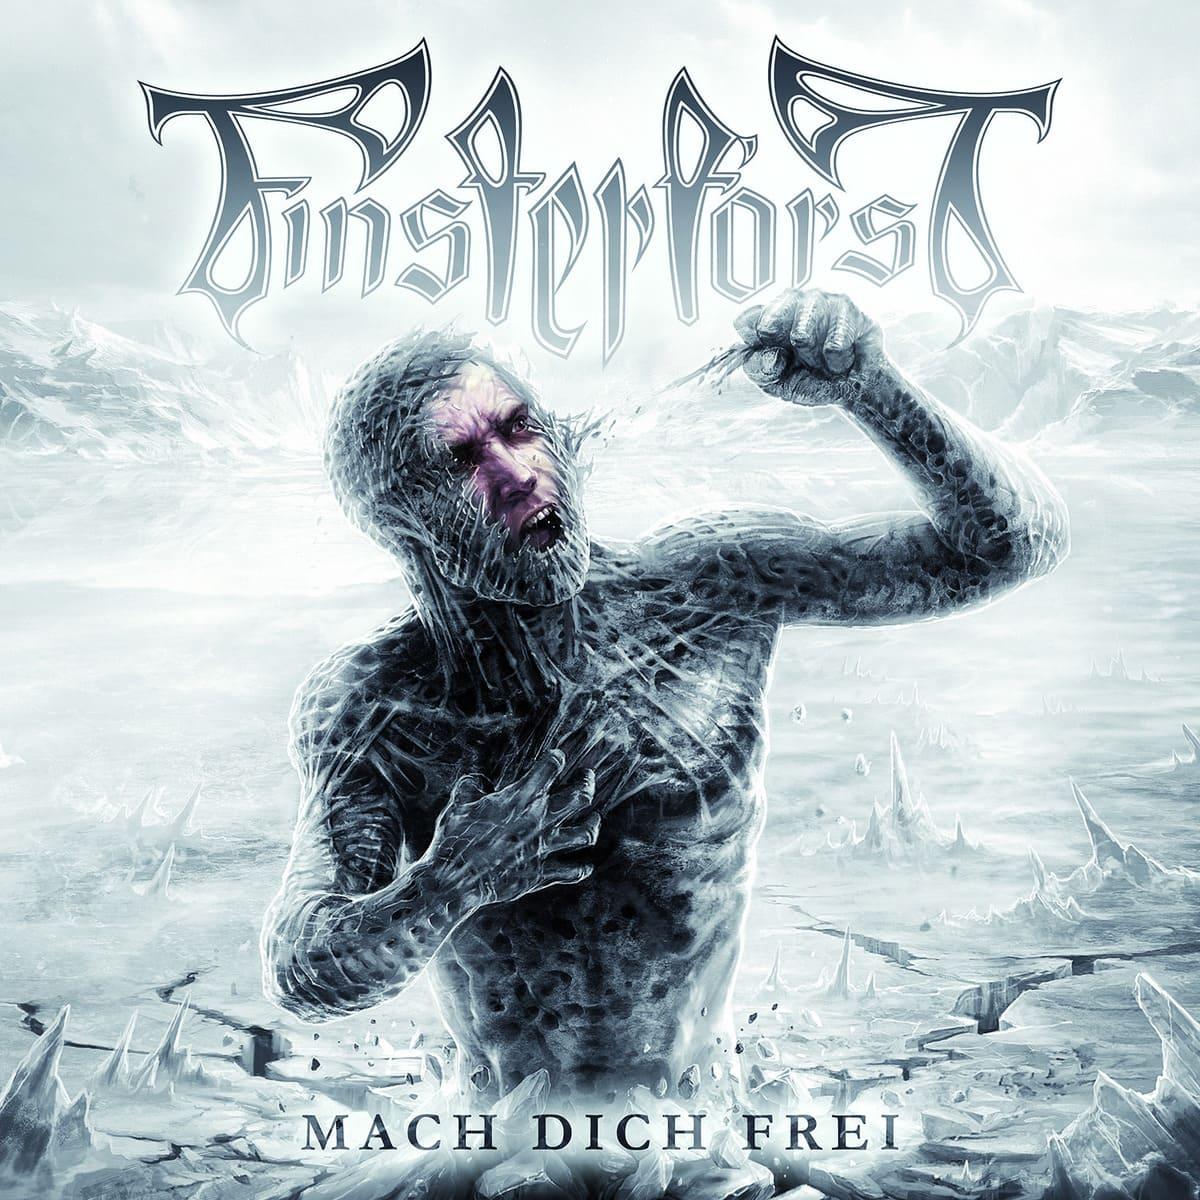 FINSTERFORST (DEU) – Mach dich frei, 2015